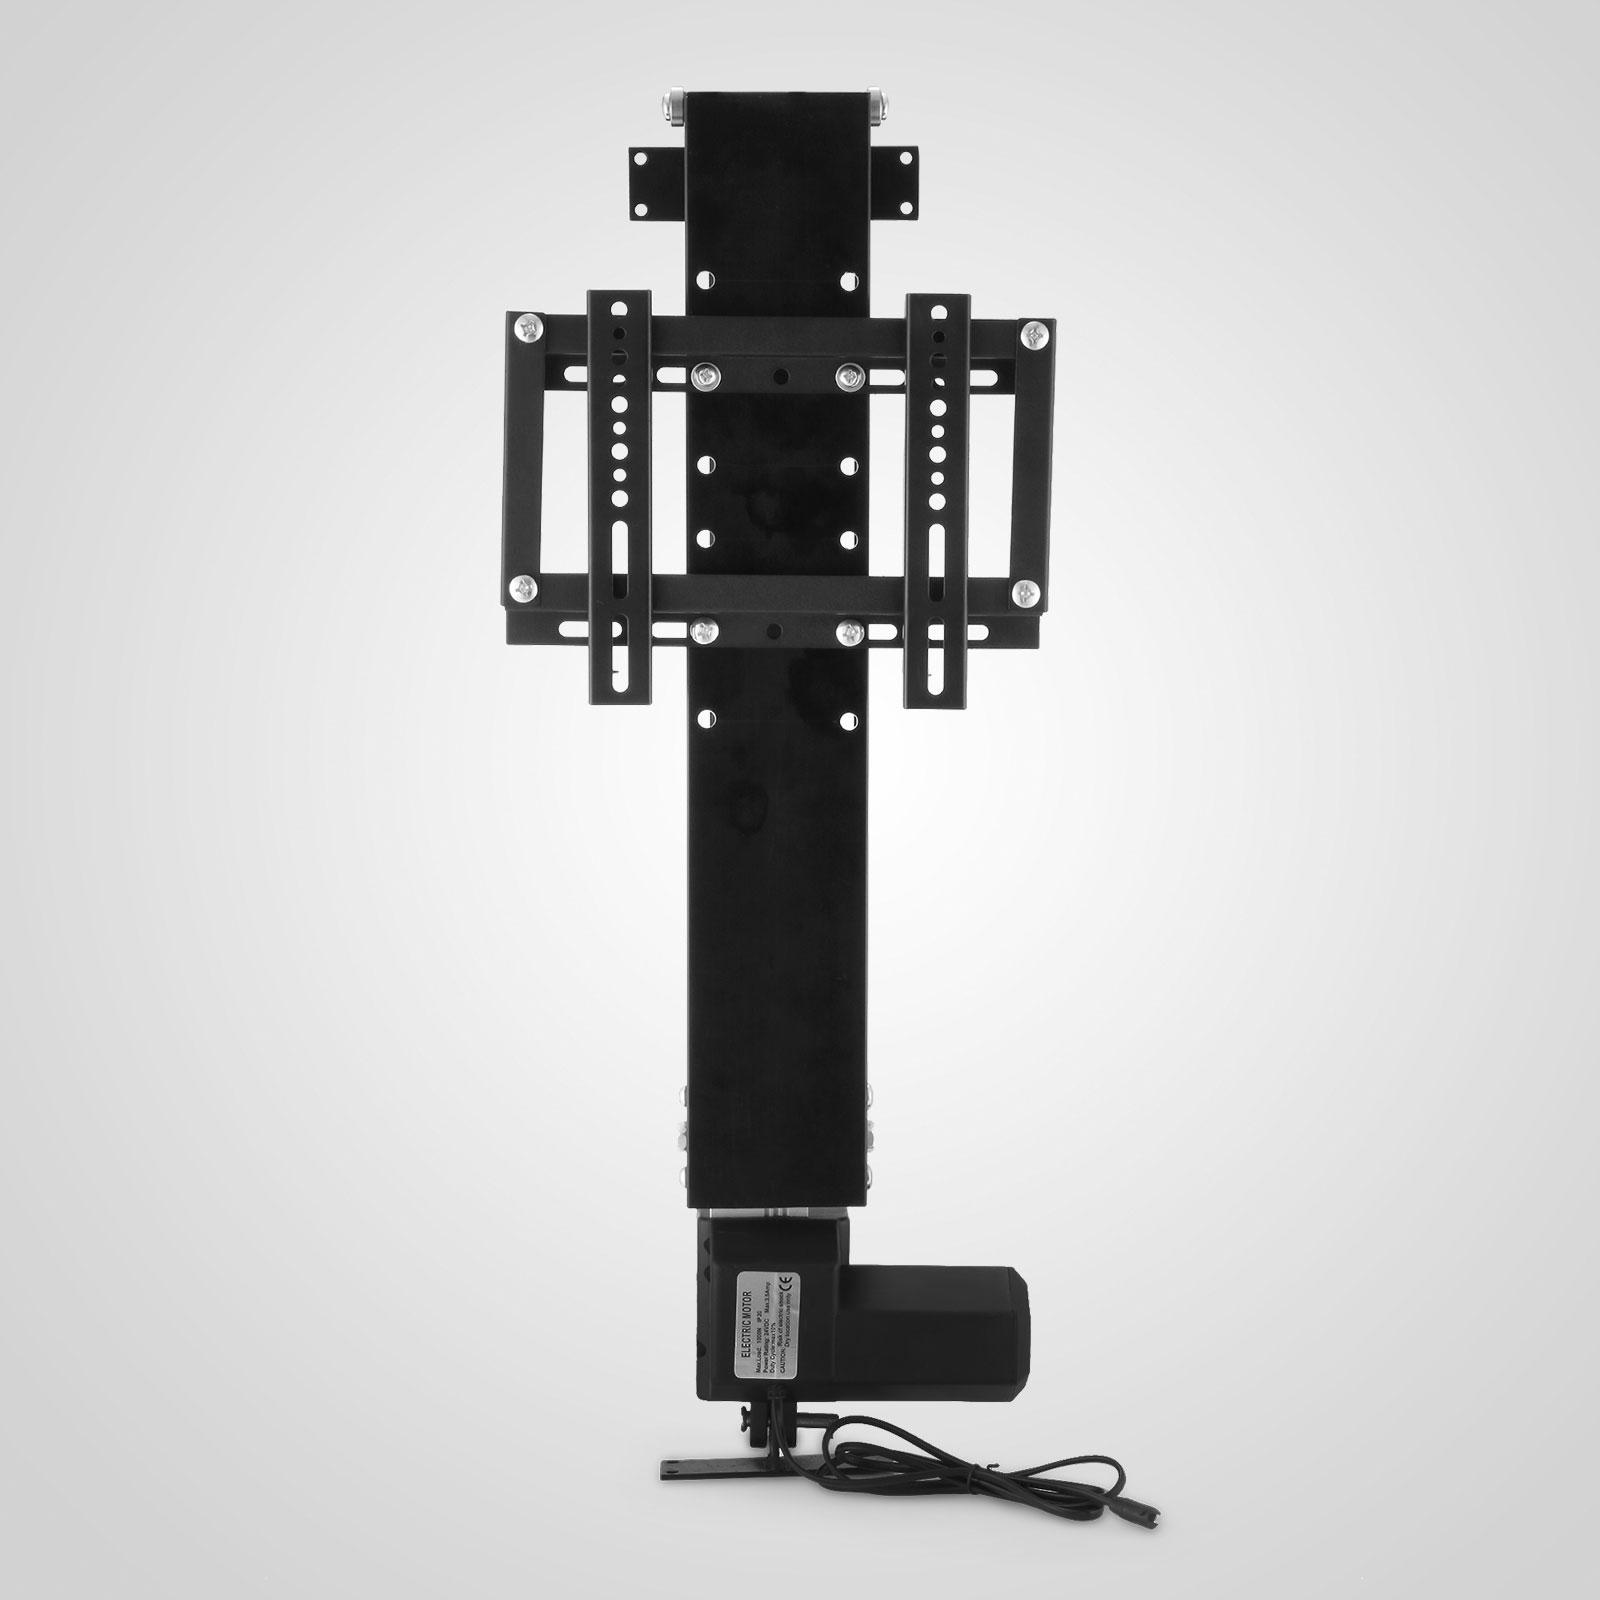 Automatical Tv Lift Bracket Wall Mounted Capacity 75kg W